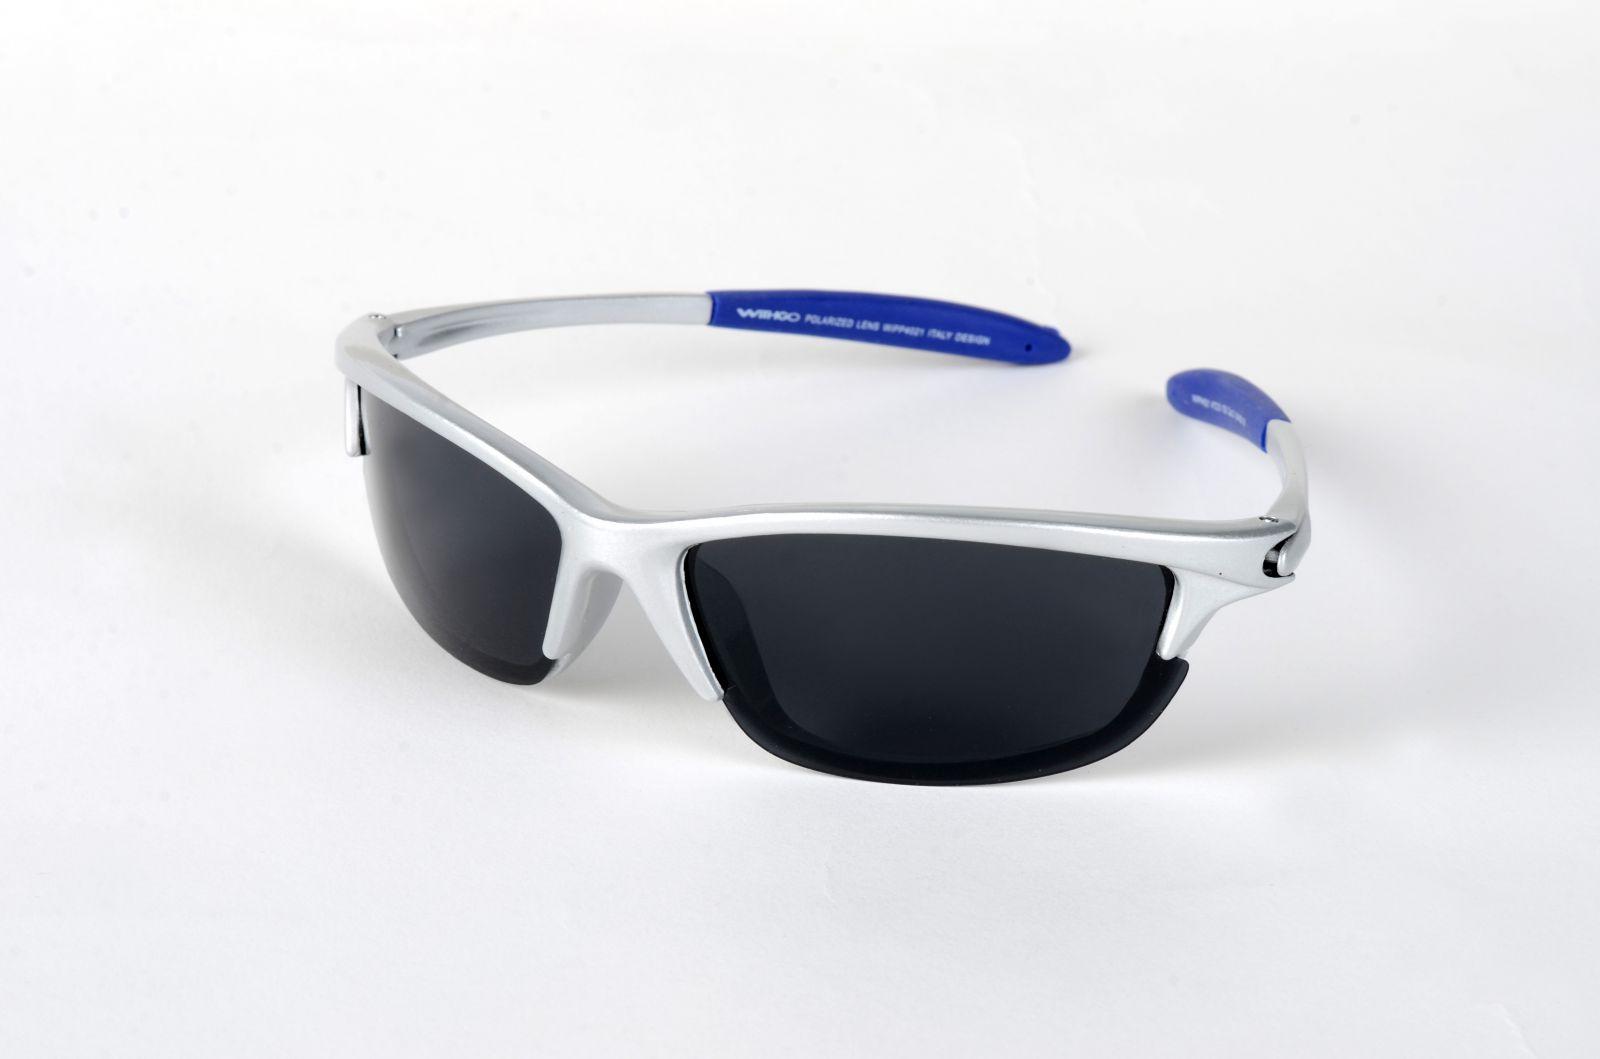 Polarizační brýle 4021 tmavomodré čočky SO Cat.3 E-batoh